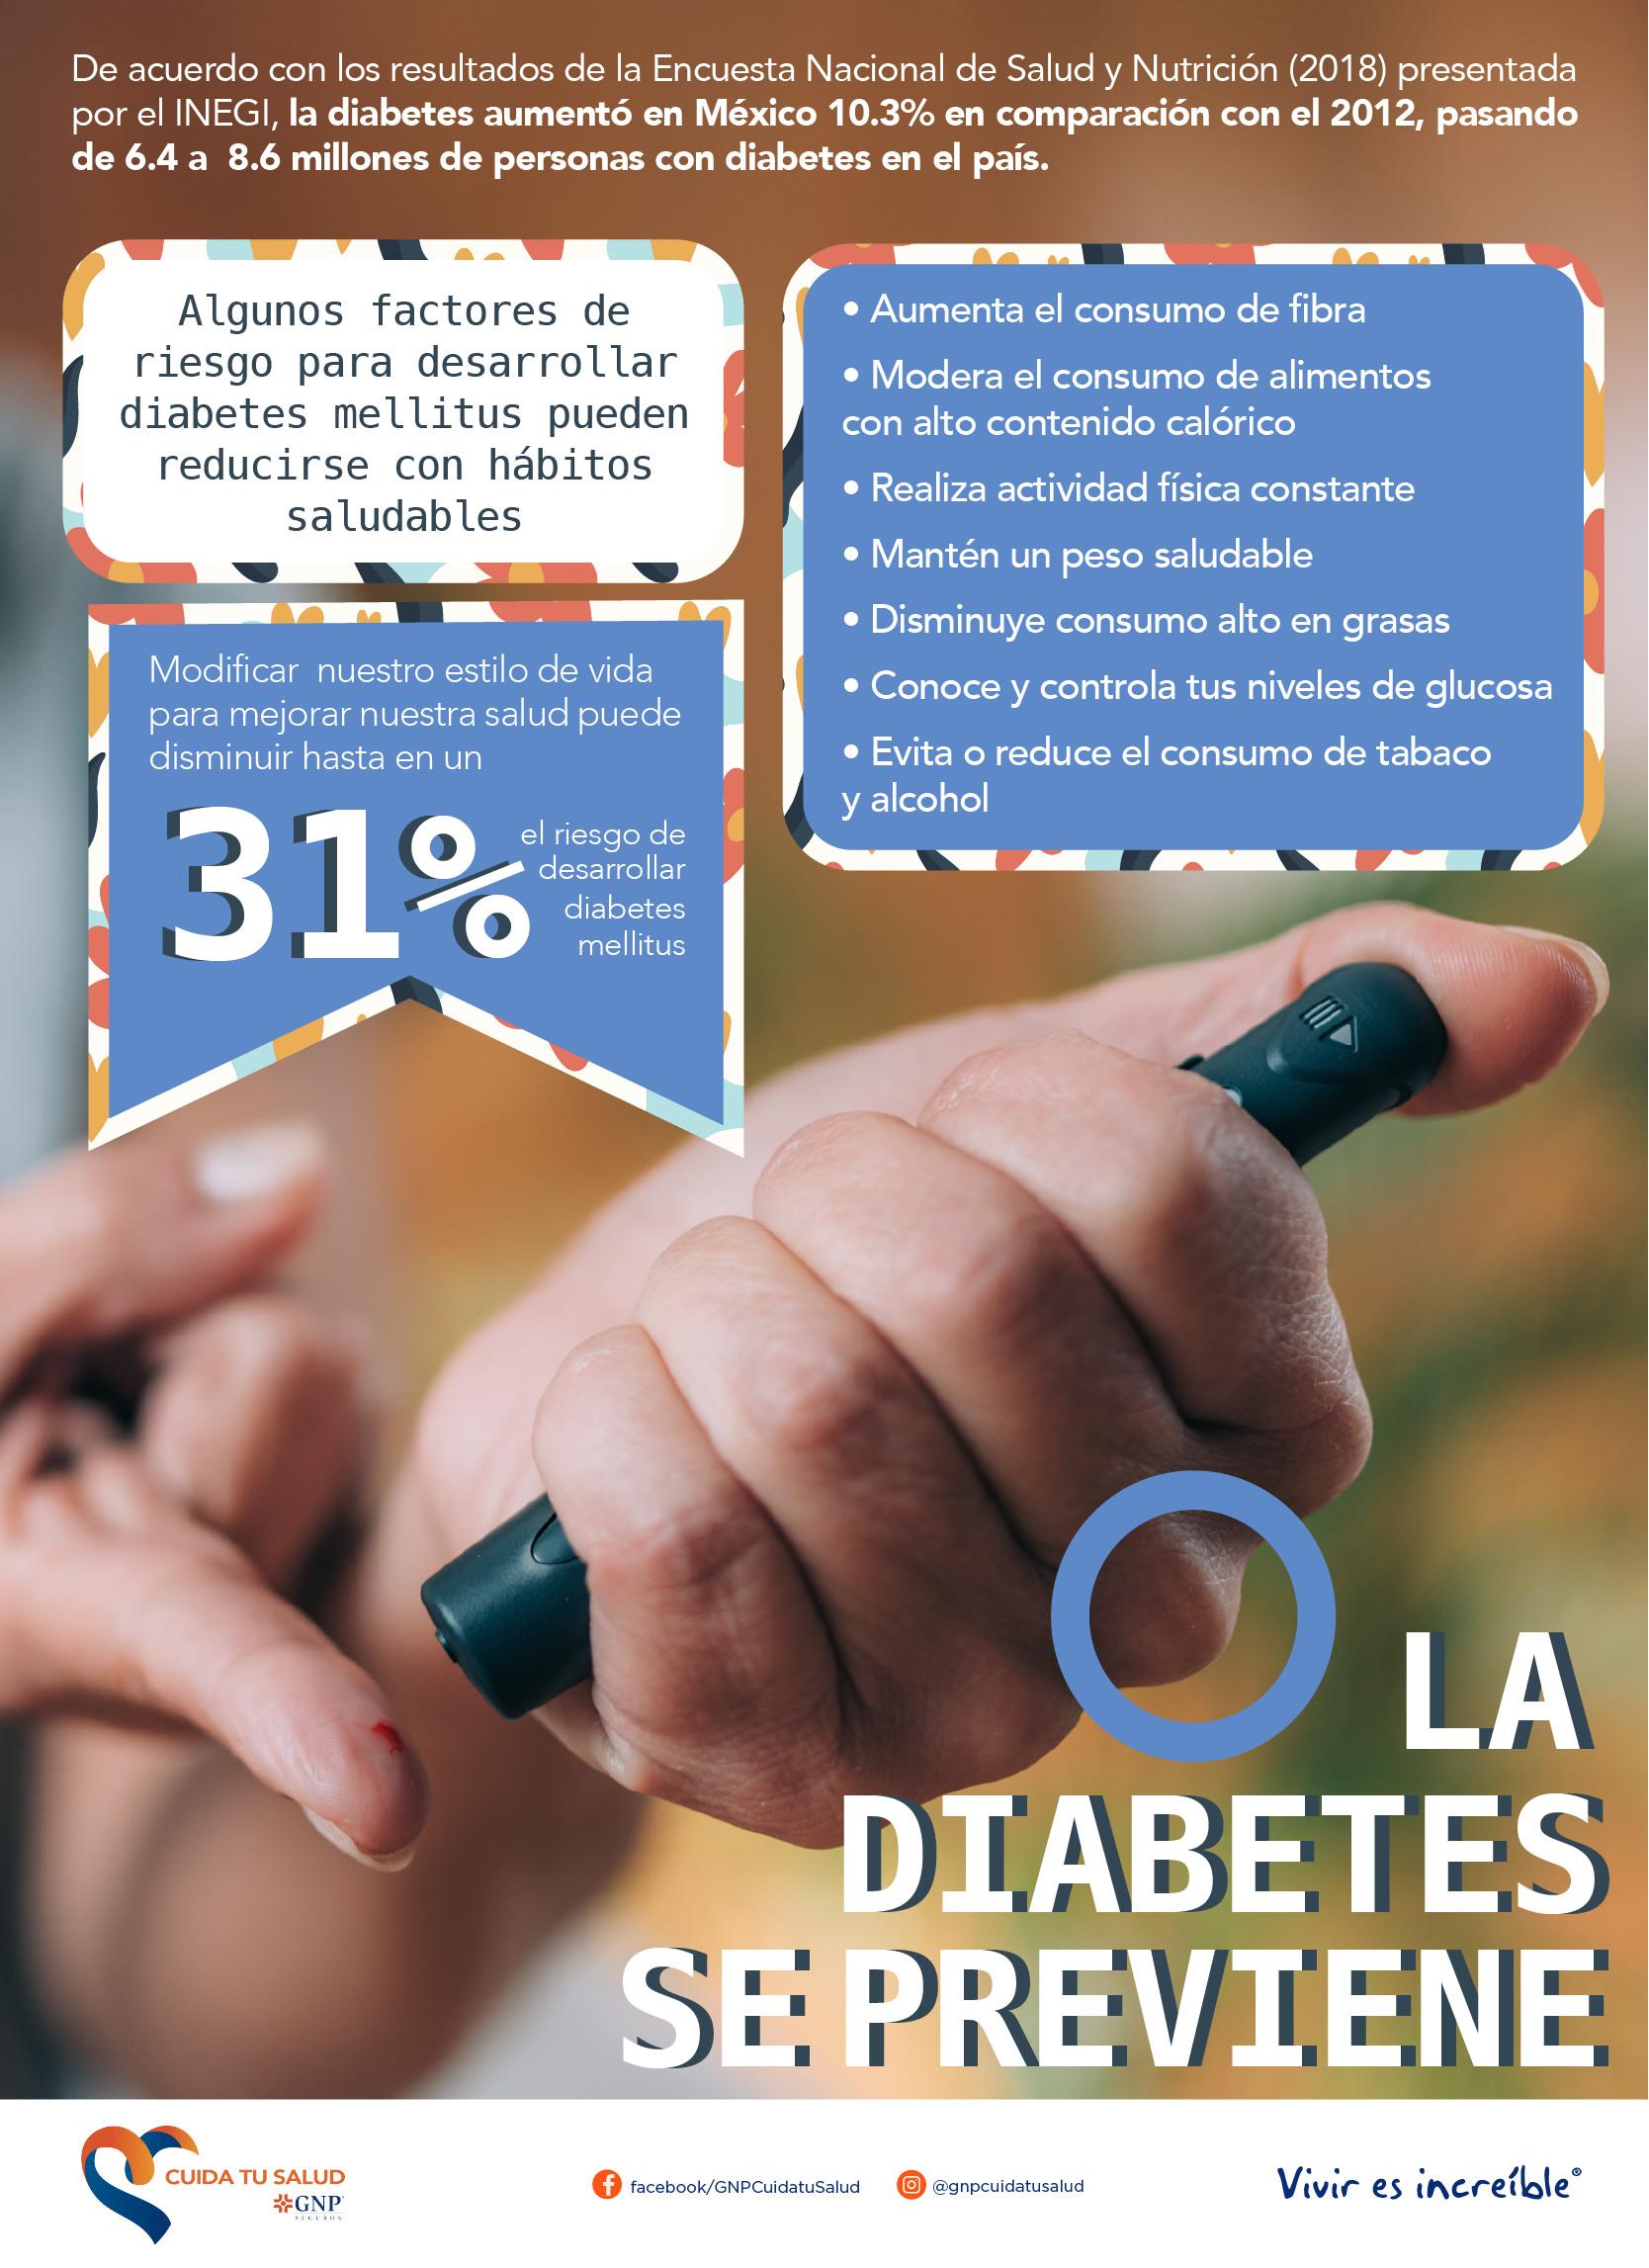 La Diabetes se previene